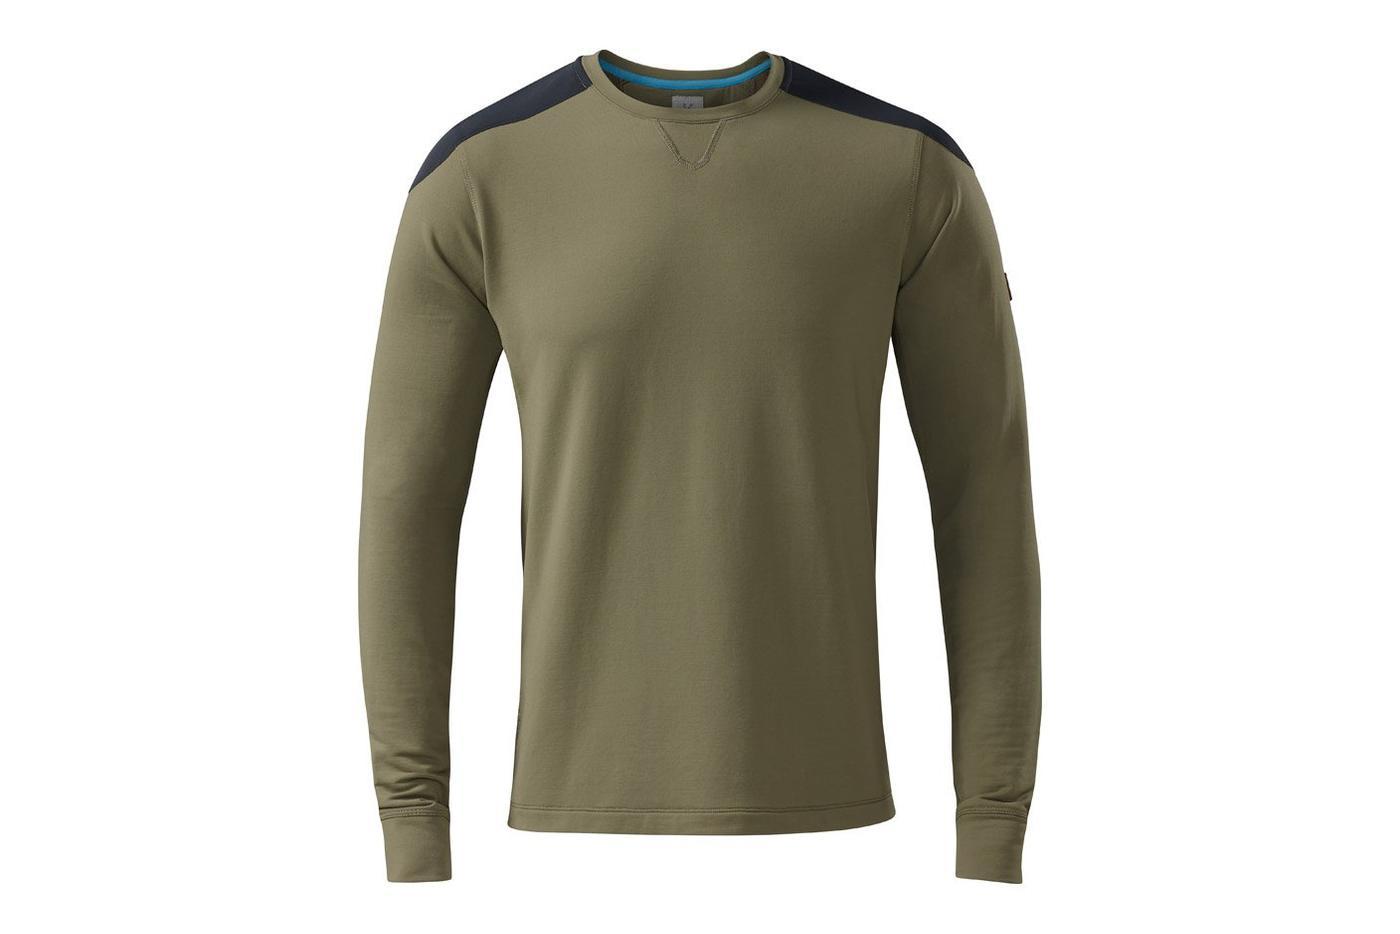 Kitsbow's Front Range Merino Sweatshirt